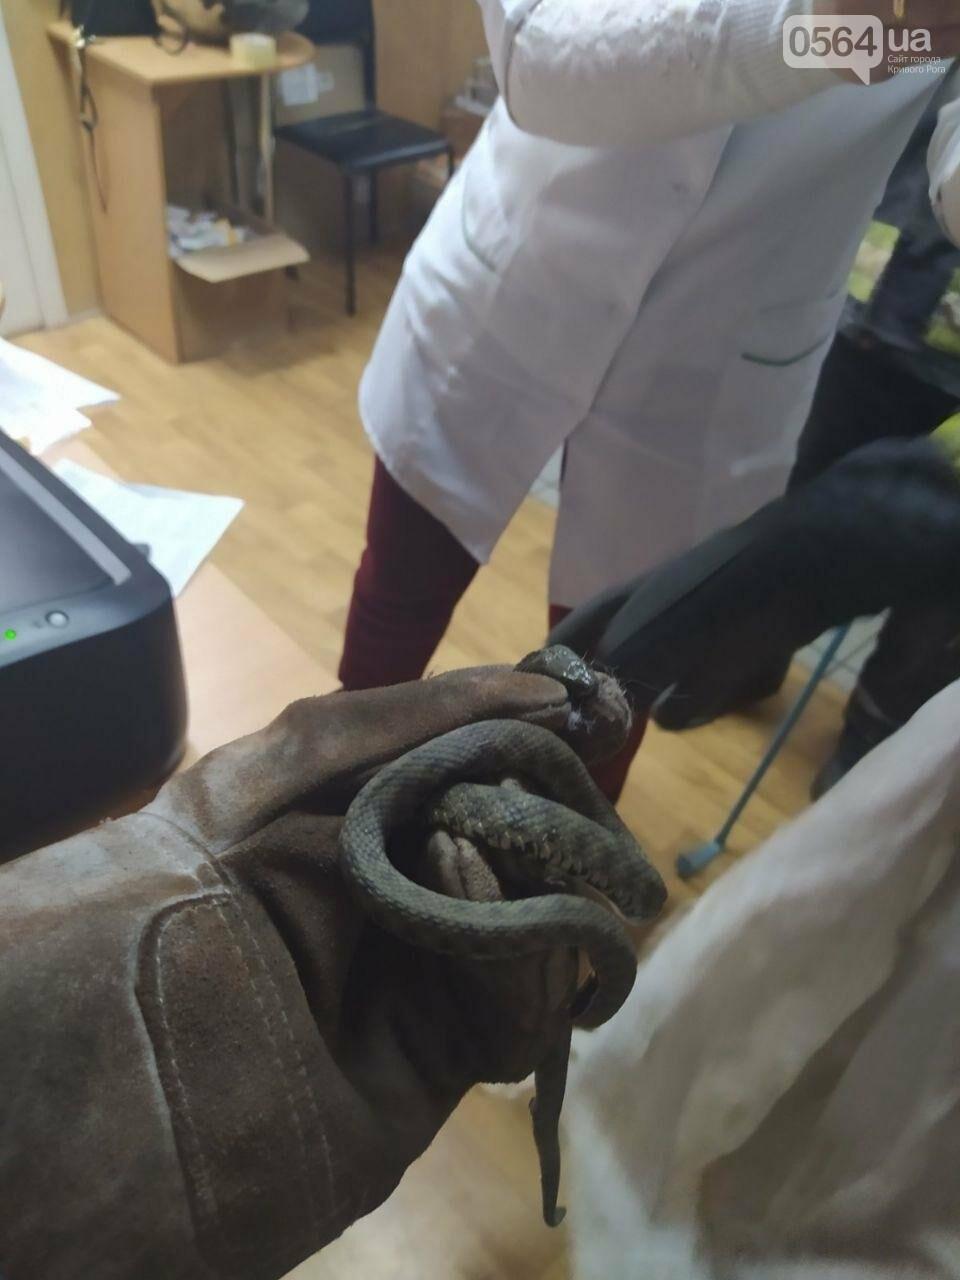 В аптеке Кривого Рога обнаружили змею, - ФОТО, фото-1